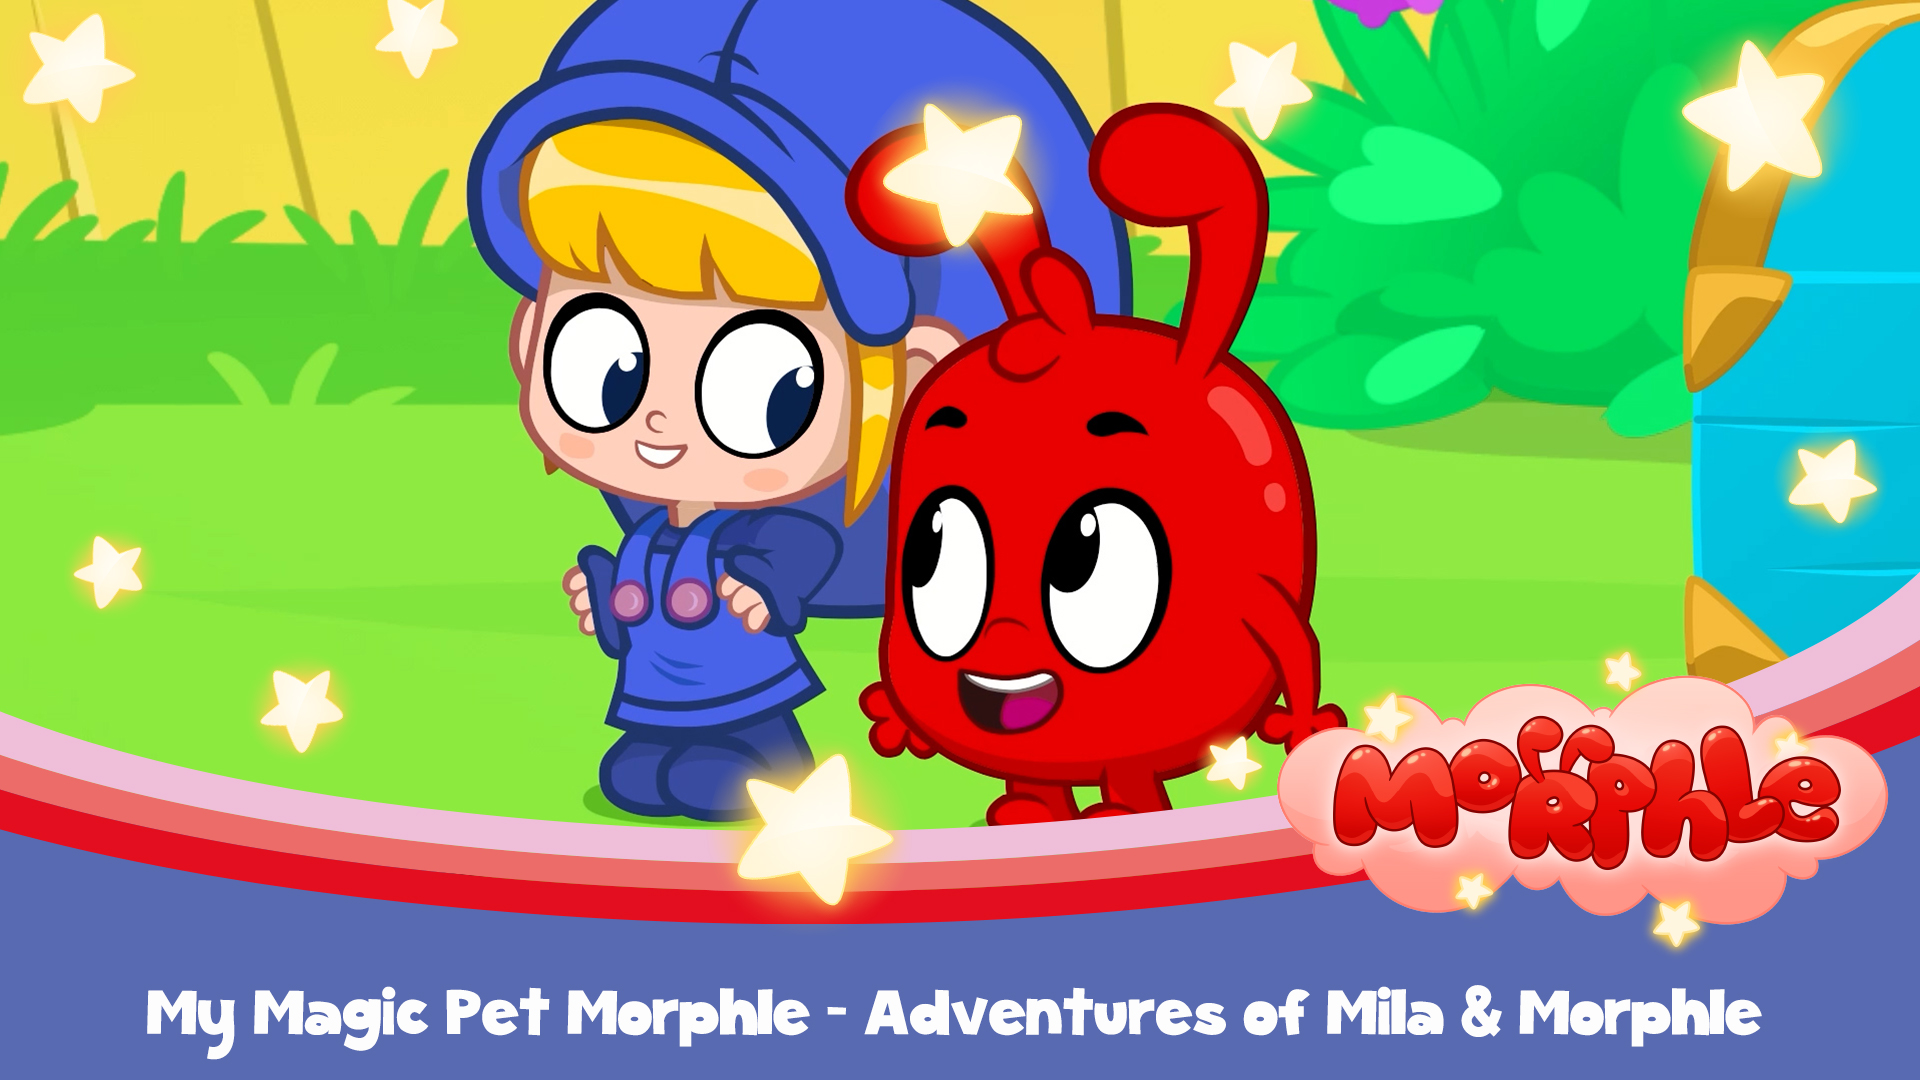 My Magic Pet Morphle - Adventures of Mila & Morphle